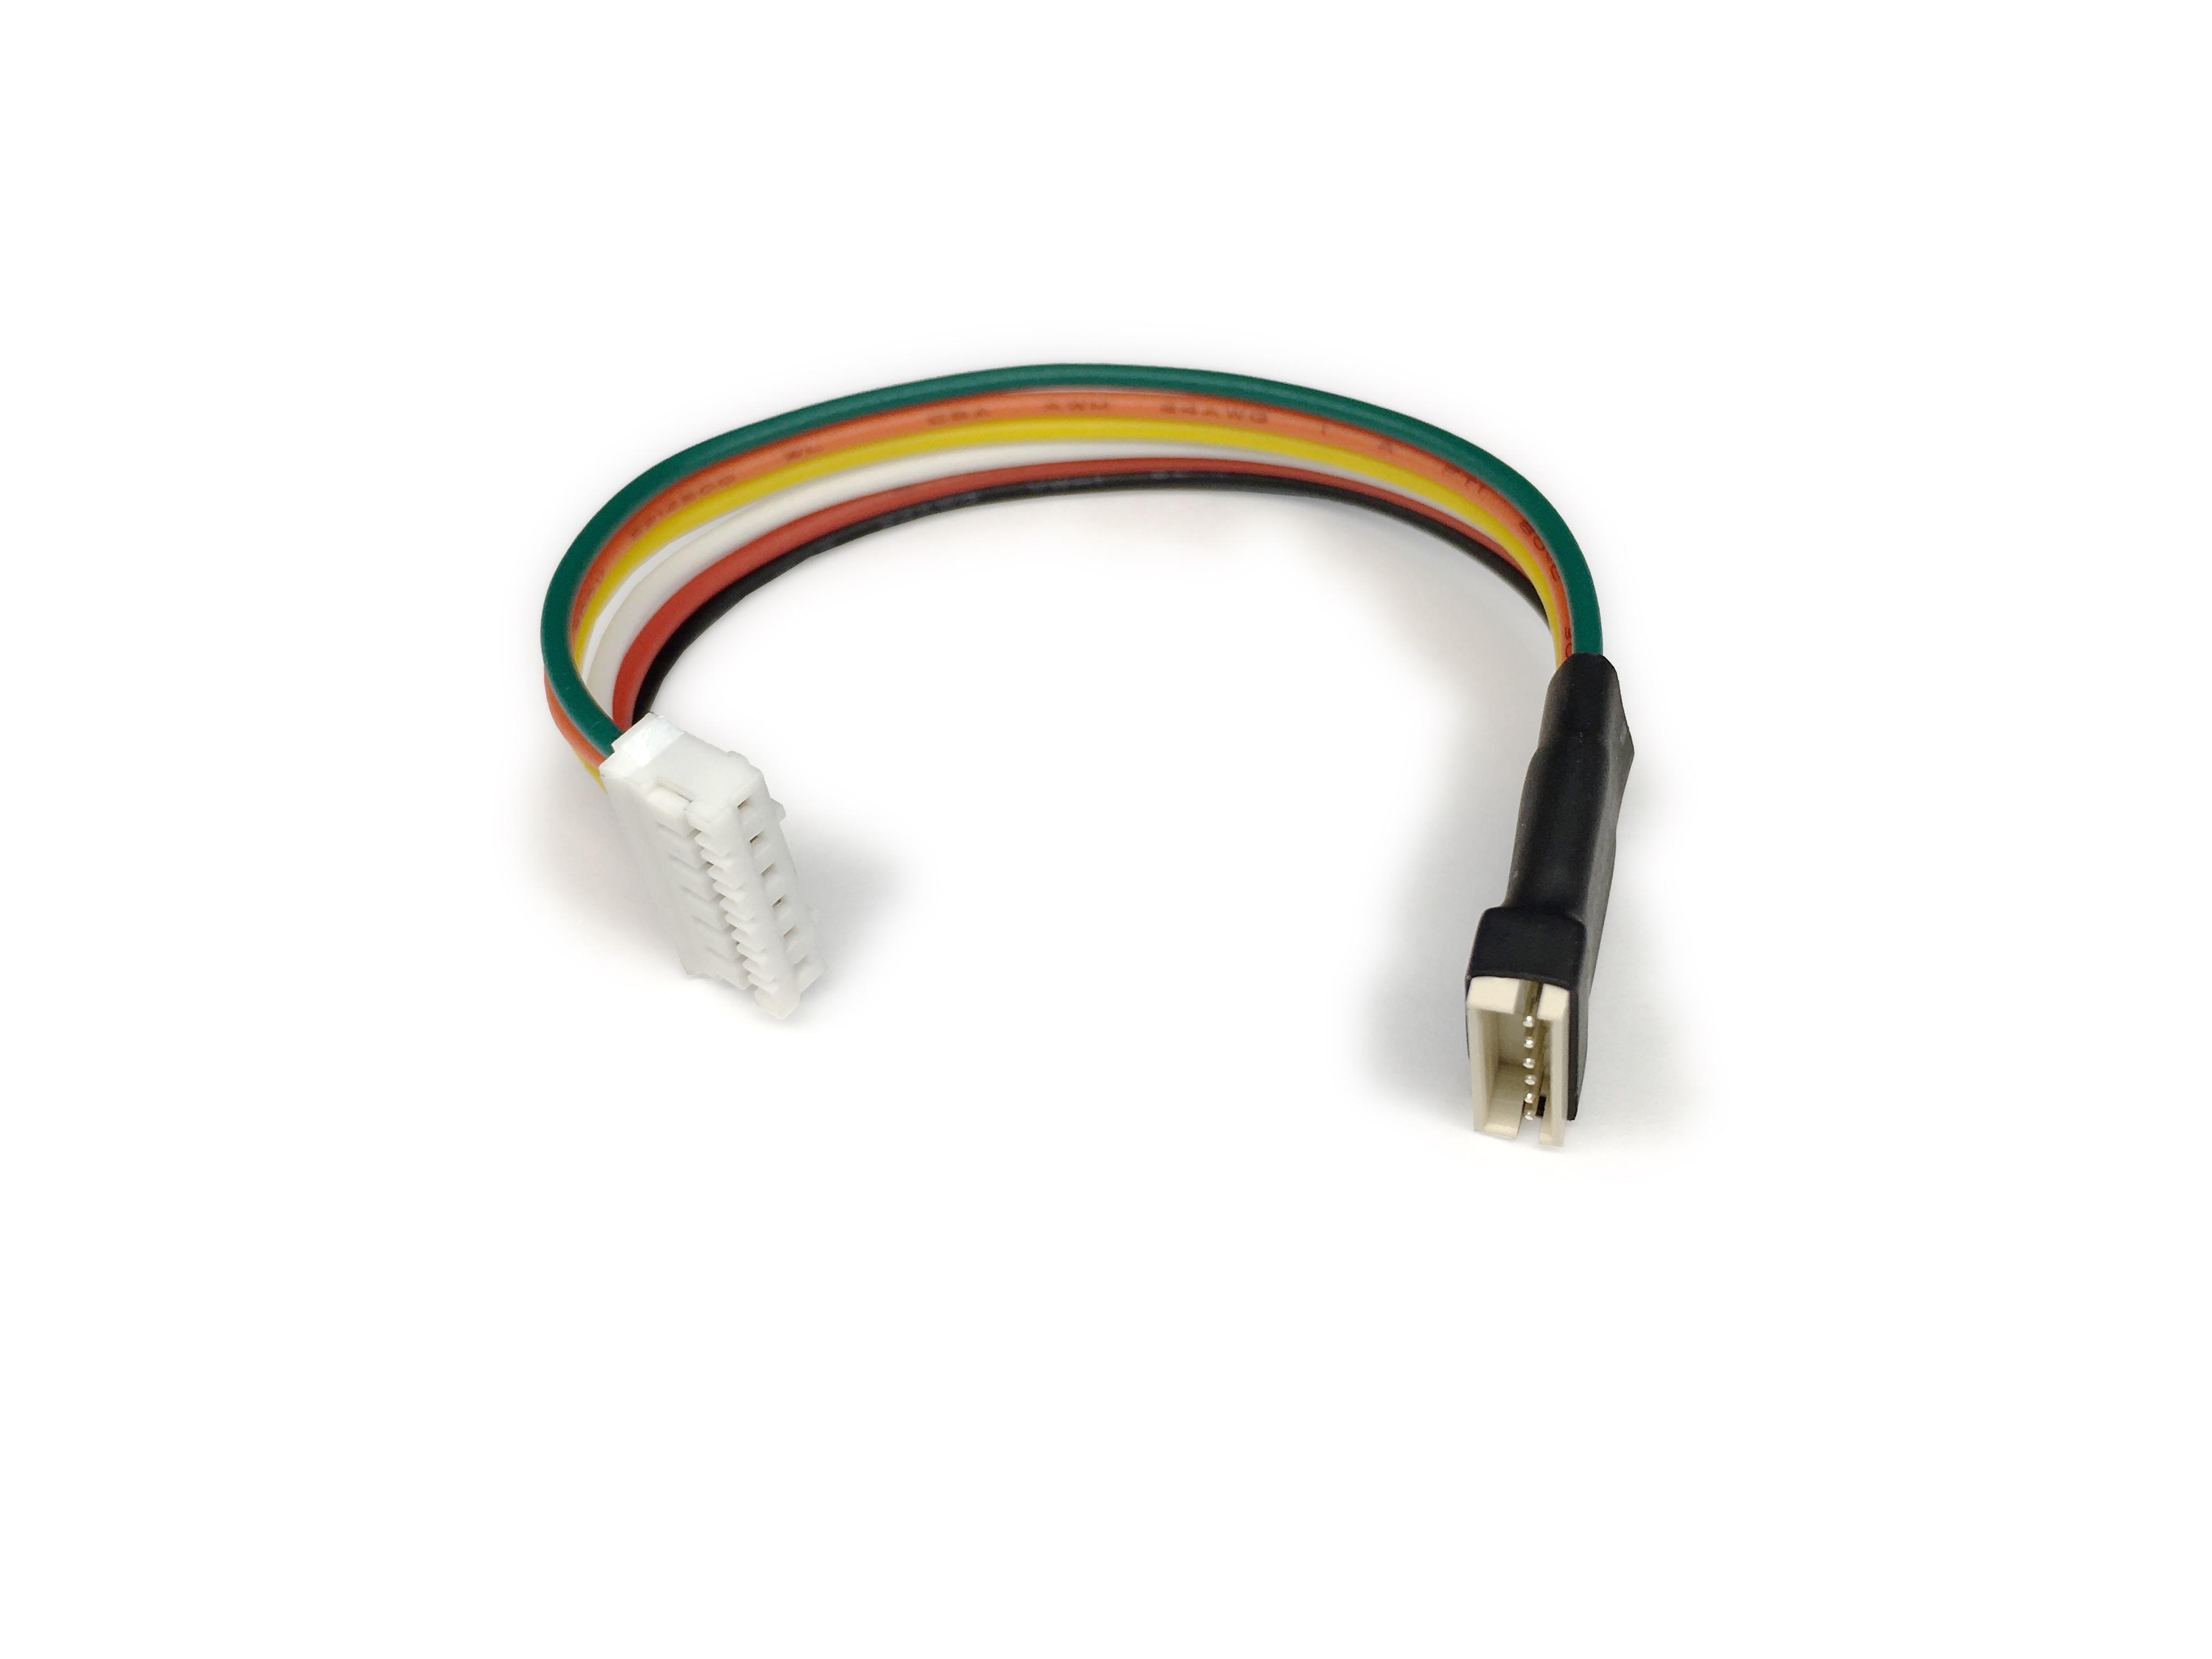 Vesc Hall Sensor Adapterkabel Wiring